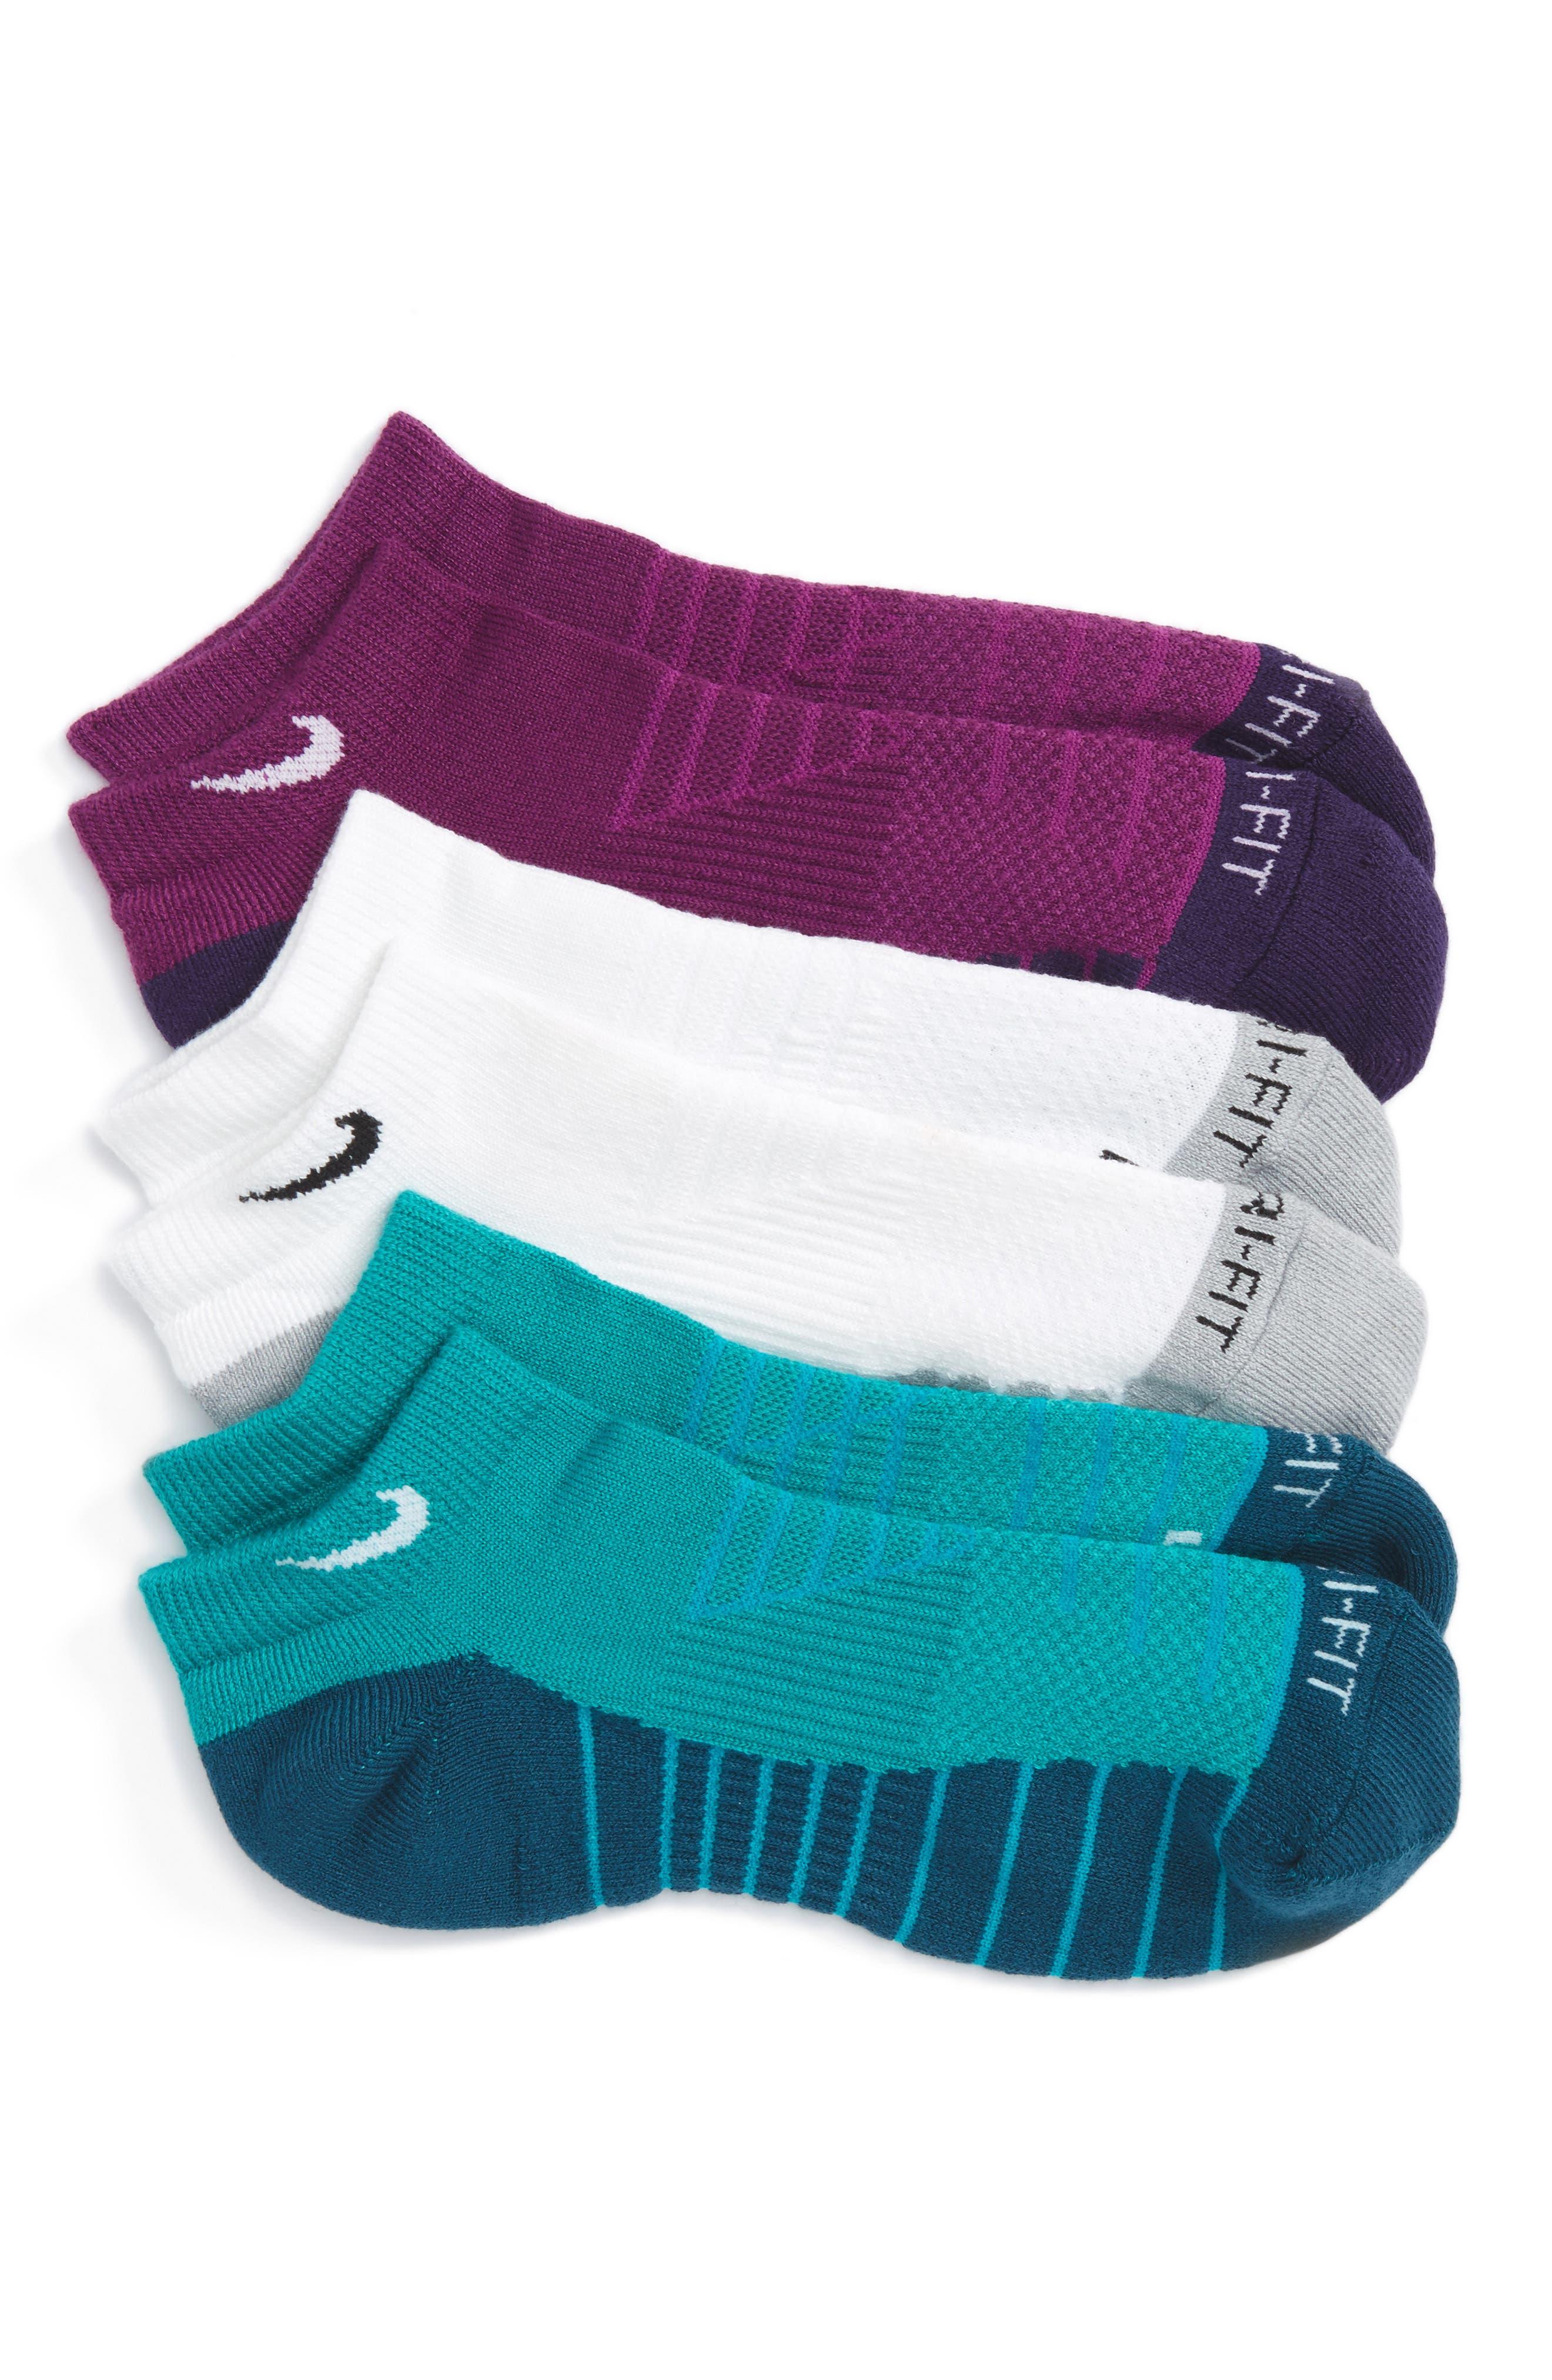 Alternate Image 1 Selected - Nike 3-Pack Cushioned Dri-FIT No-Show Socks (Big Kid)